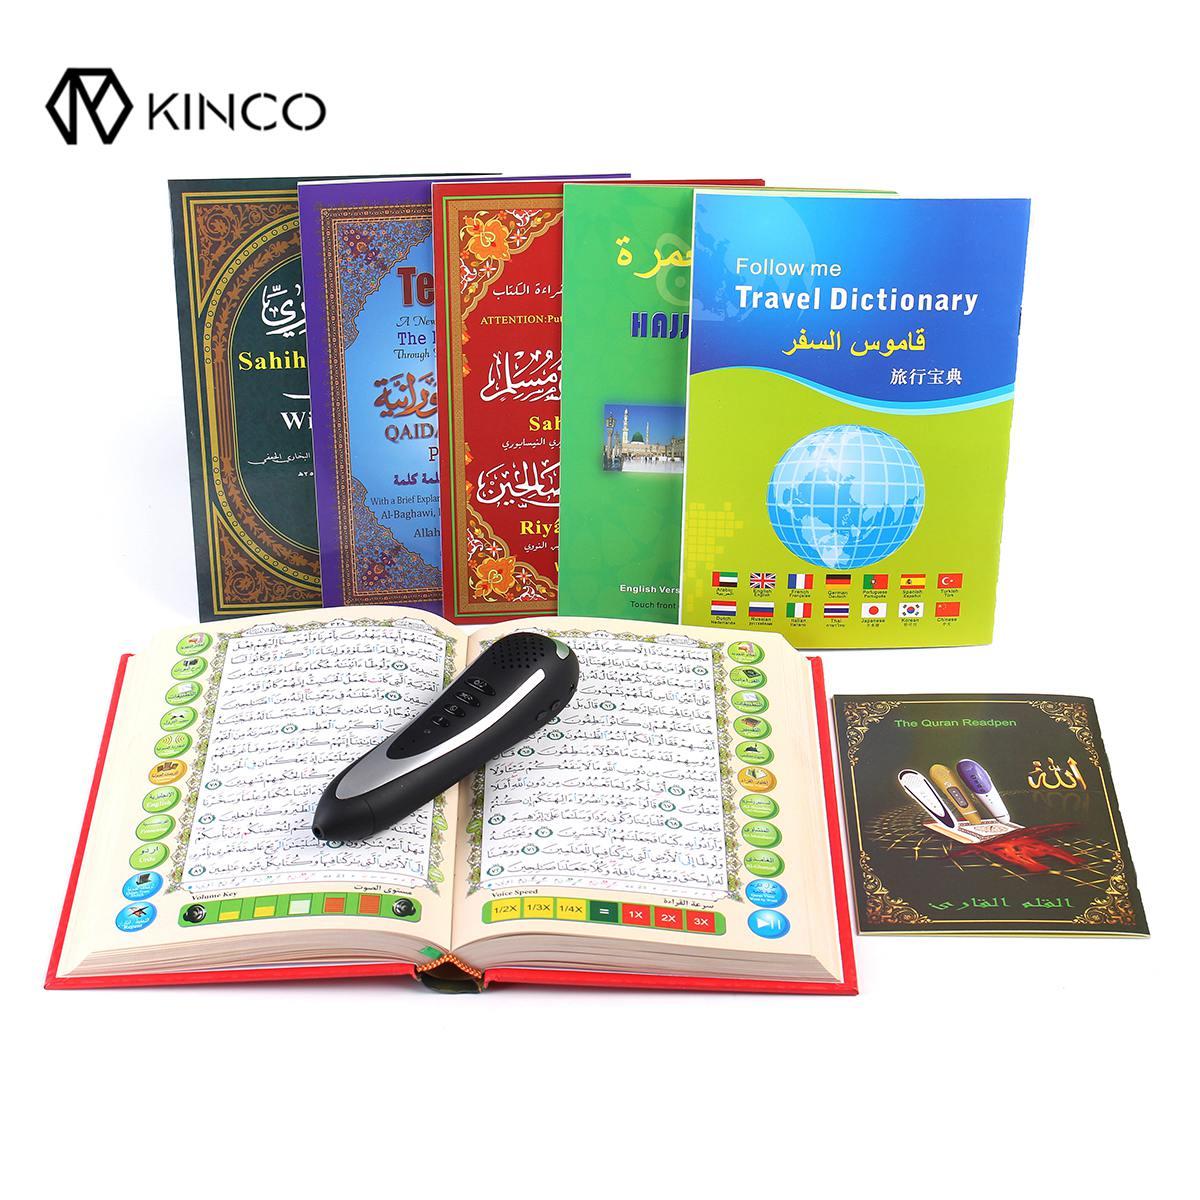 KINCO 4/8GB Digital Quran Reader Pen Speaker Recite FM MP3 TF With 6 Books Digital Quran Pen Reader 23 Languages проигрыватель для корана quran enmac pq15